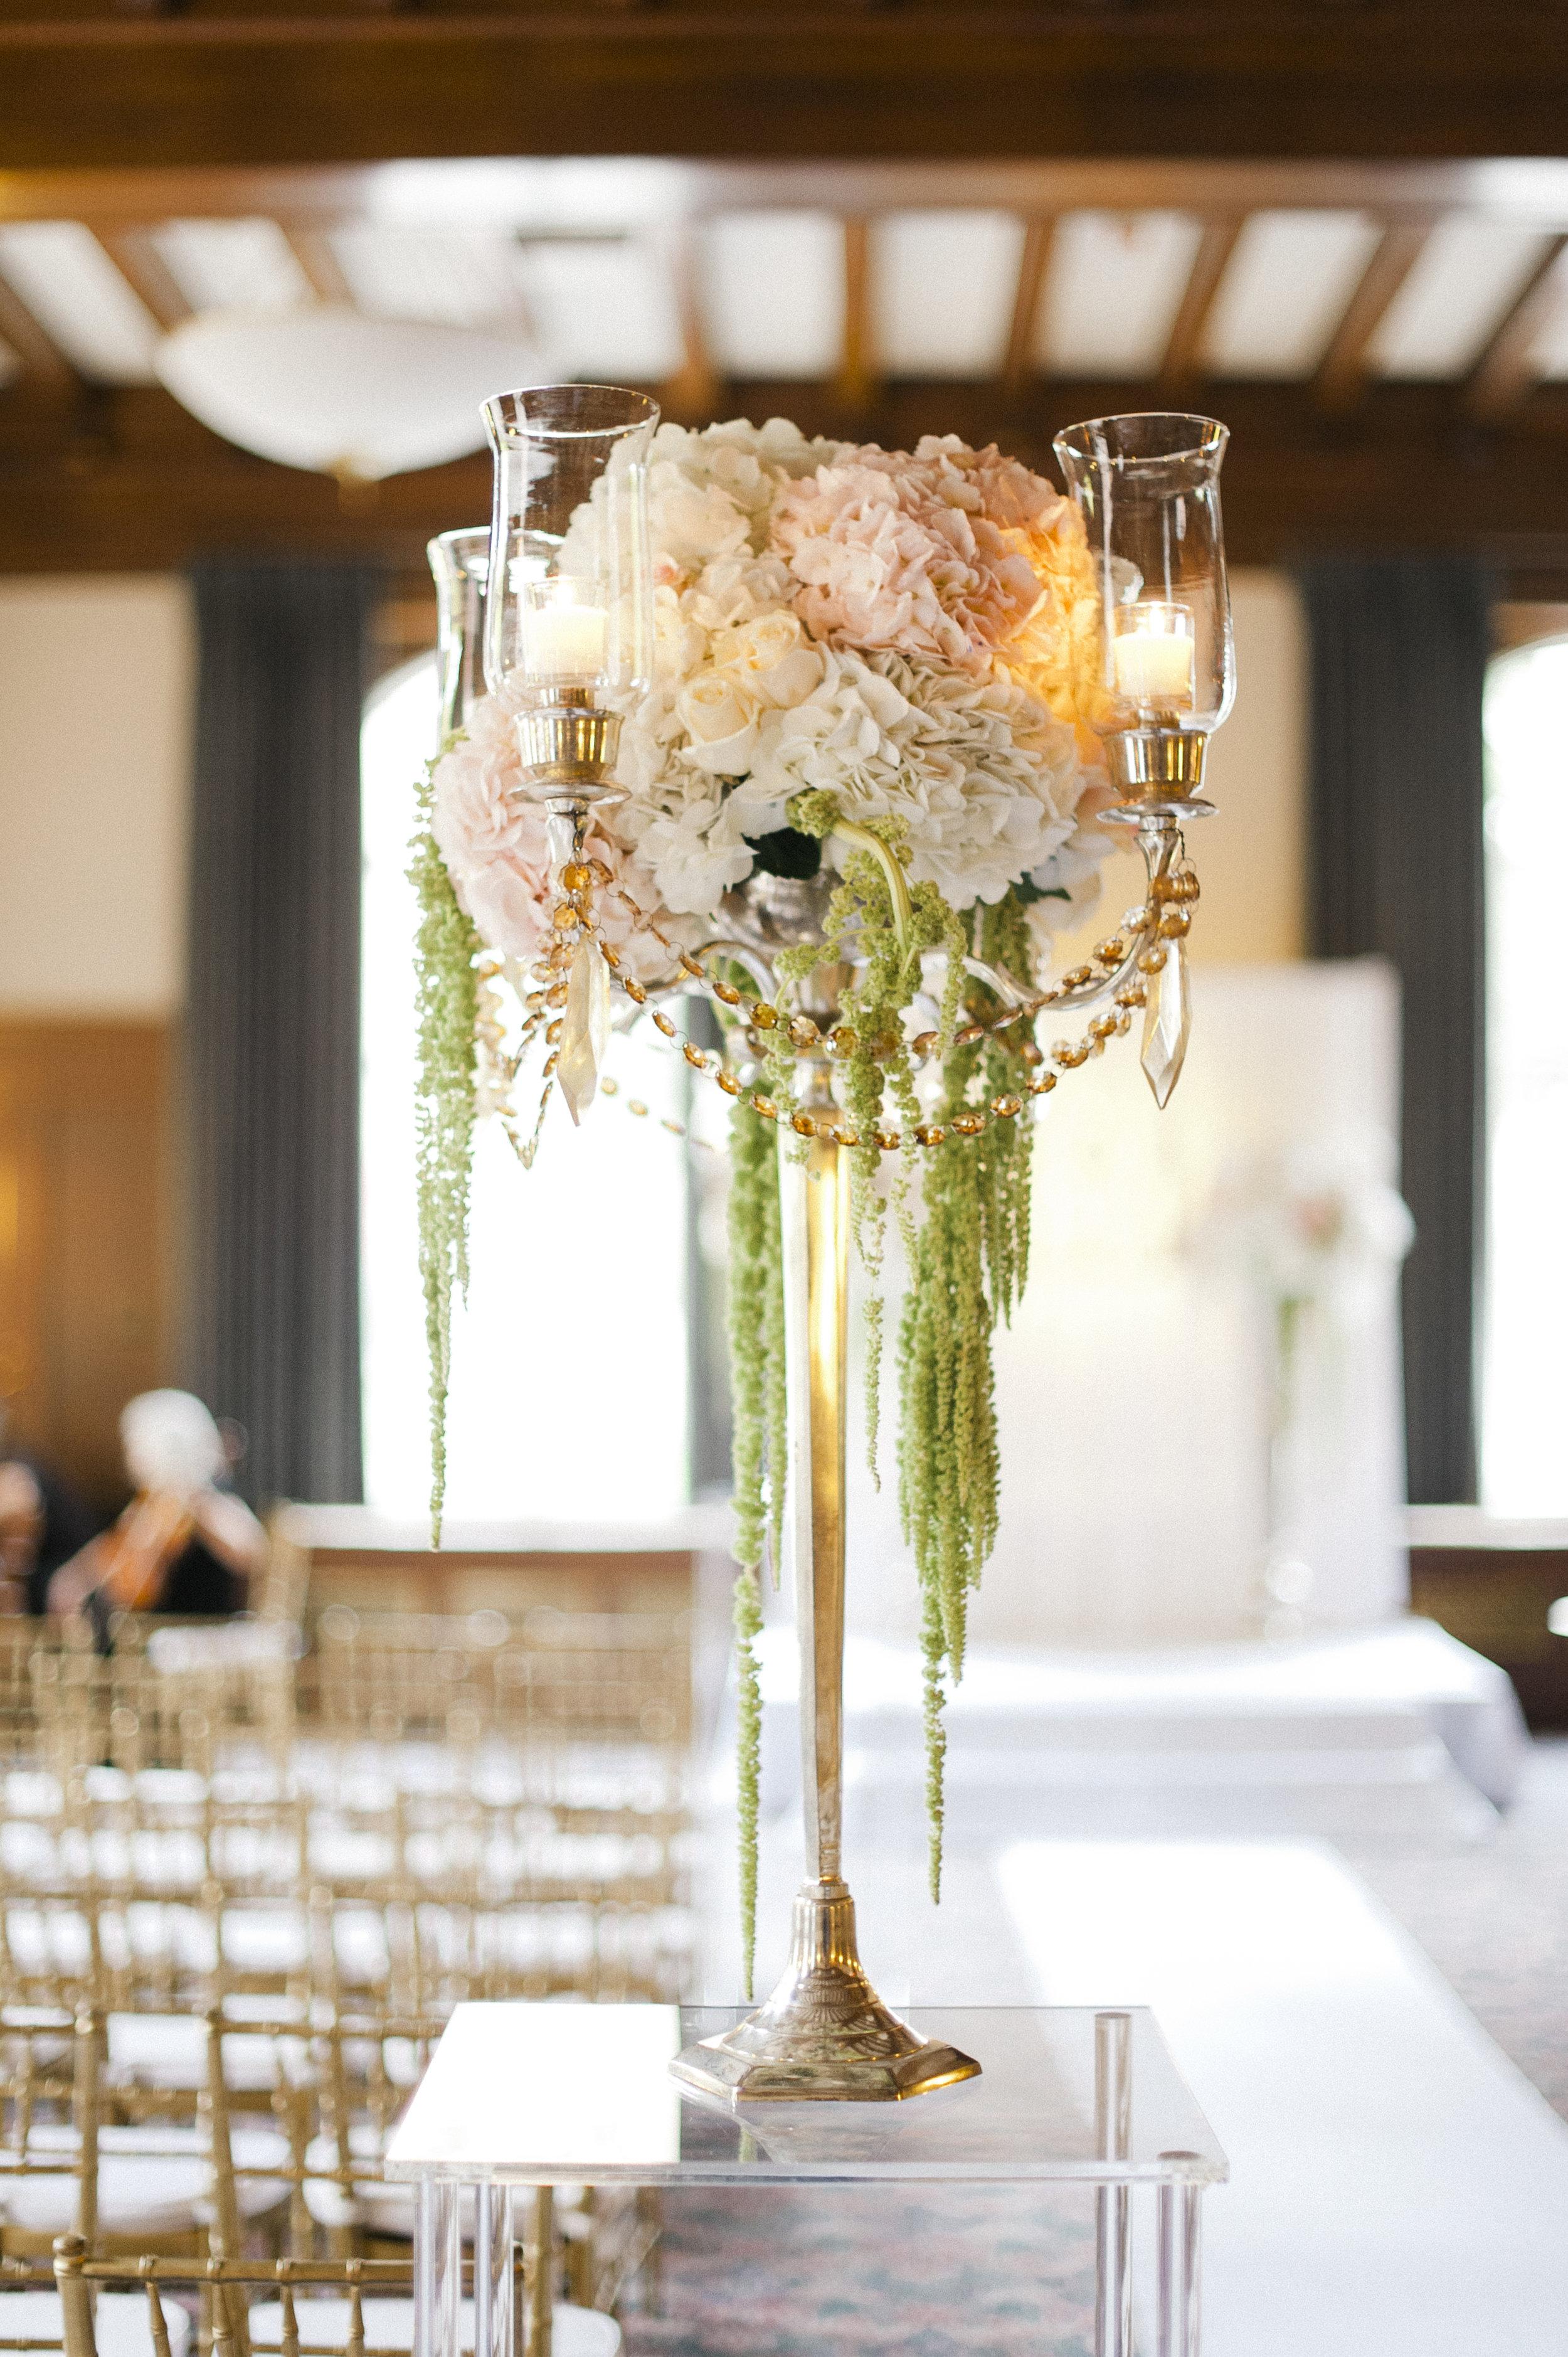 Lovell-Dillahunty Wedding_545.jpg